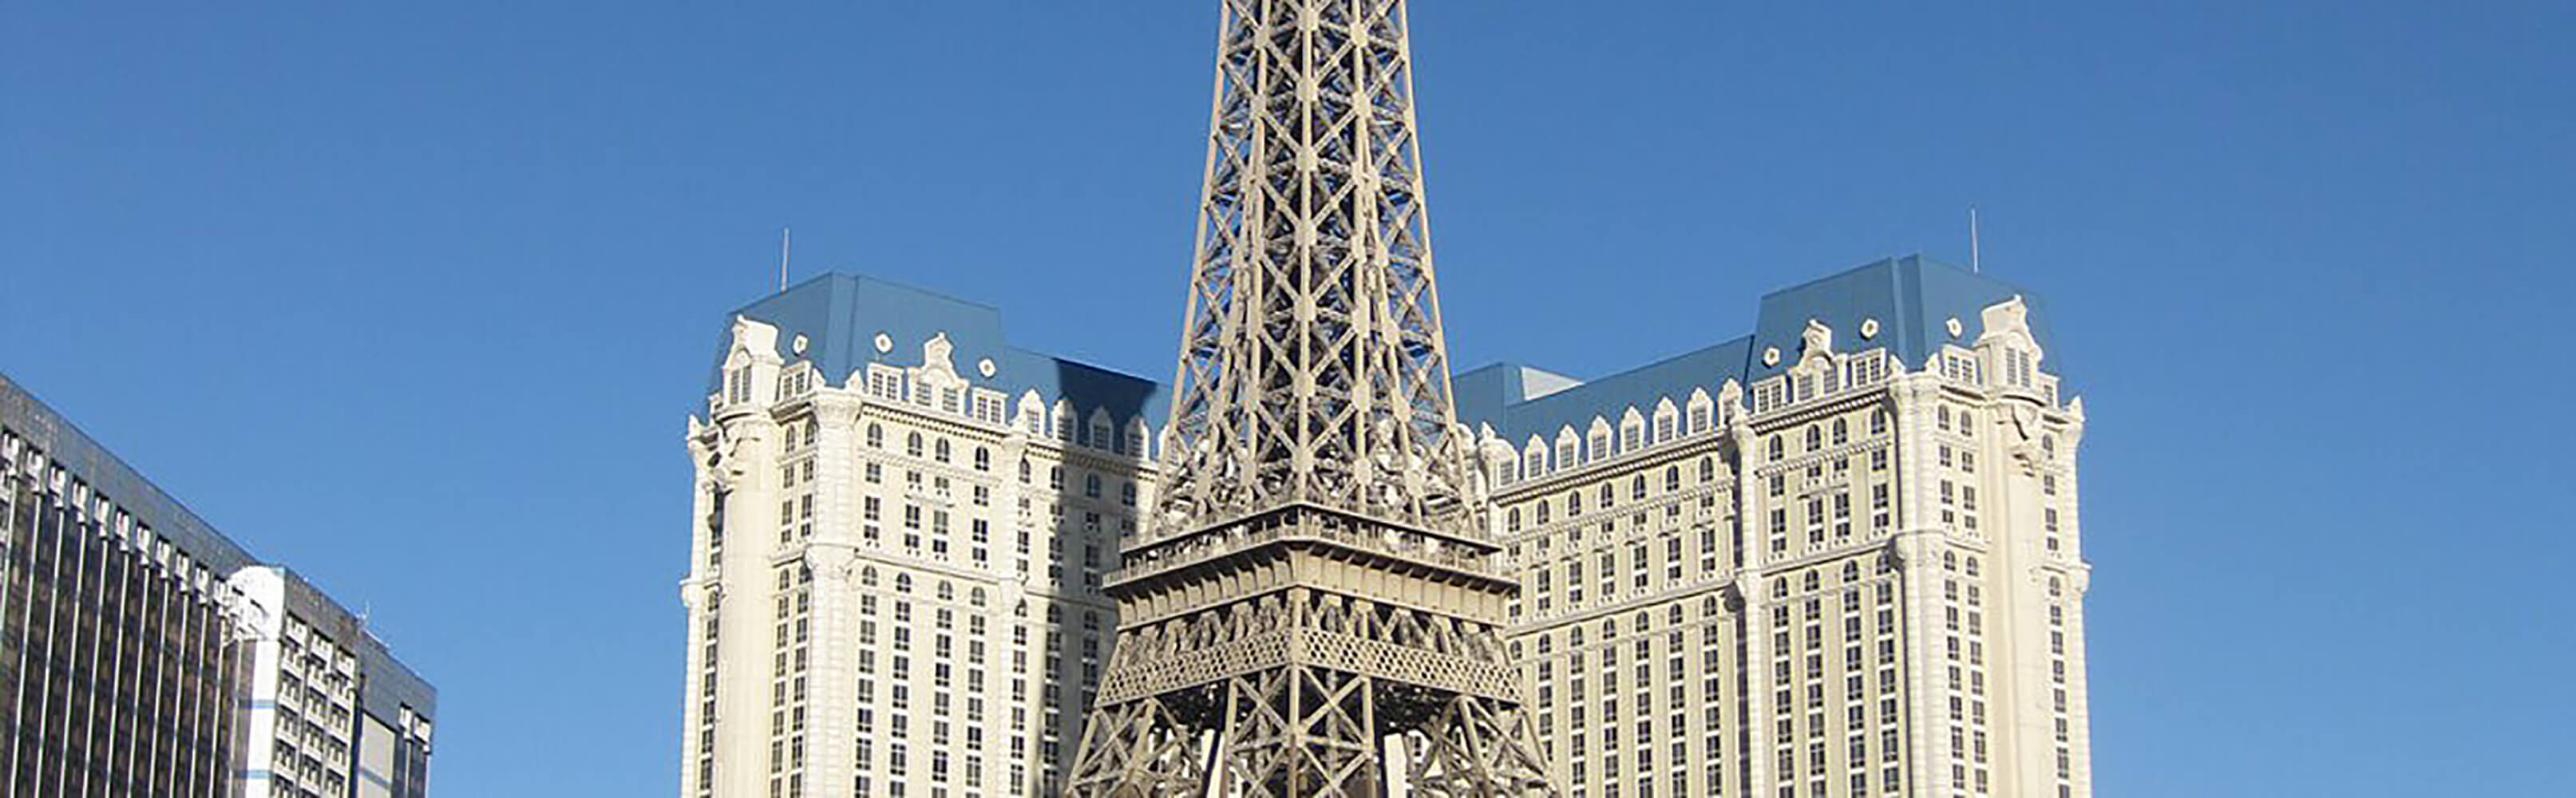 Paris Las Vegas 1